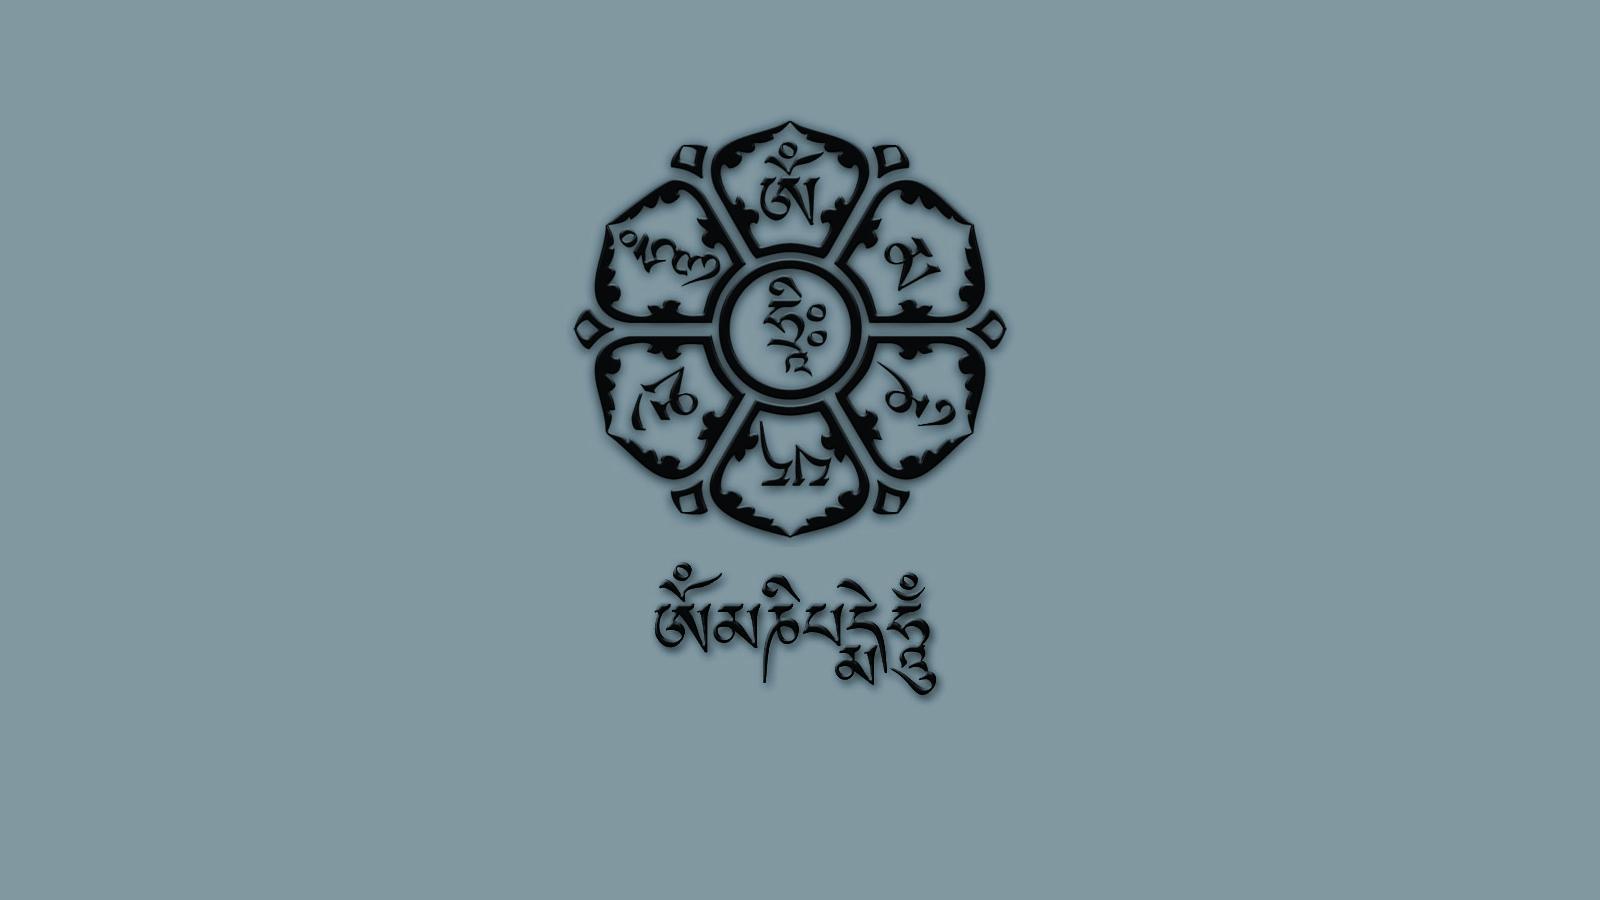 Om Mani Padme Hum Hd Wallpapers Images Free Download Om Mani Padme Hum Buddha Art Padme